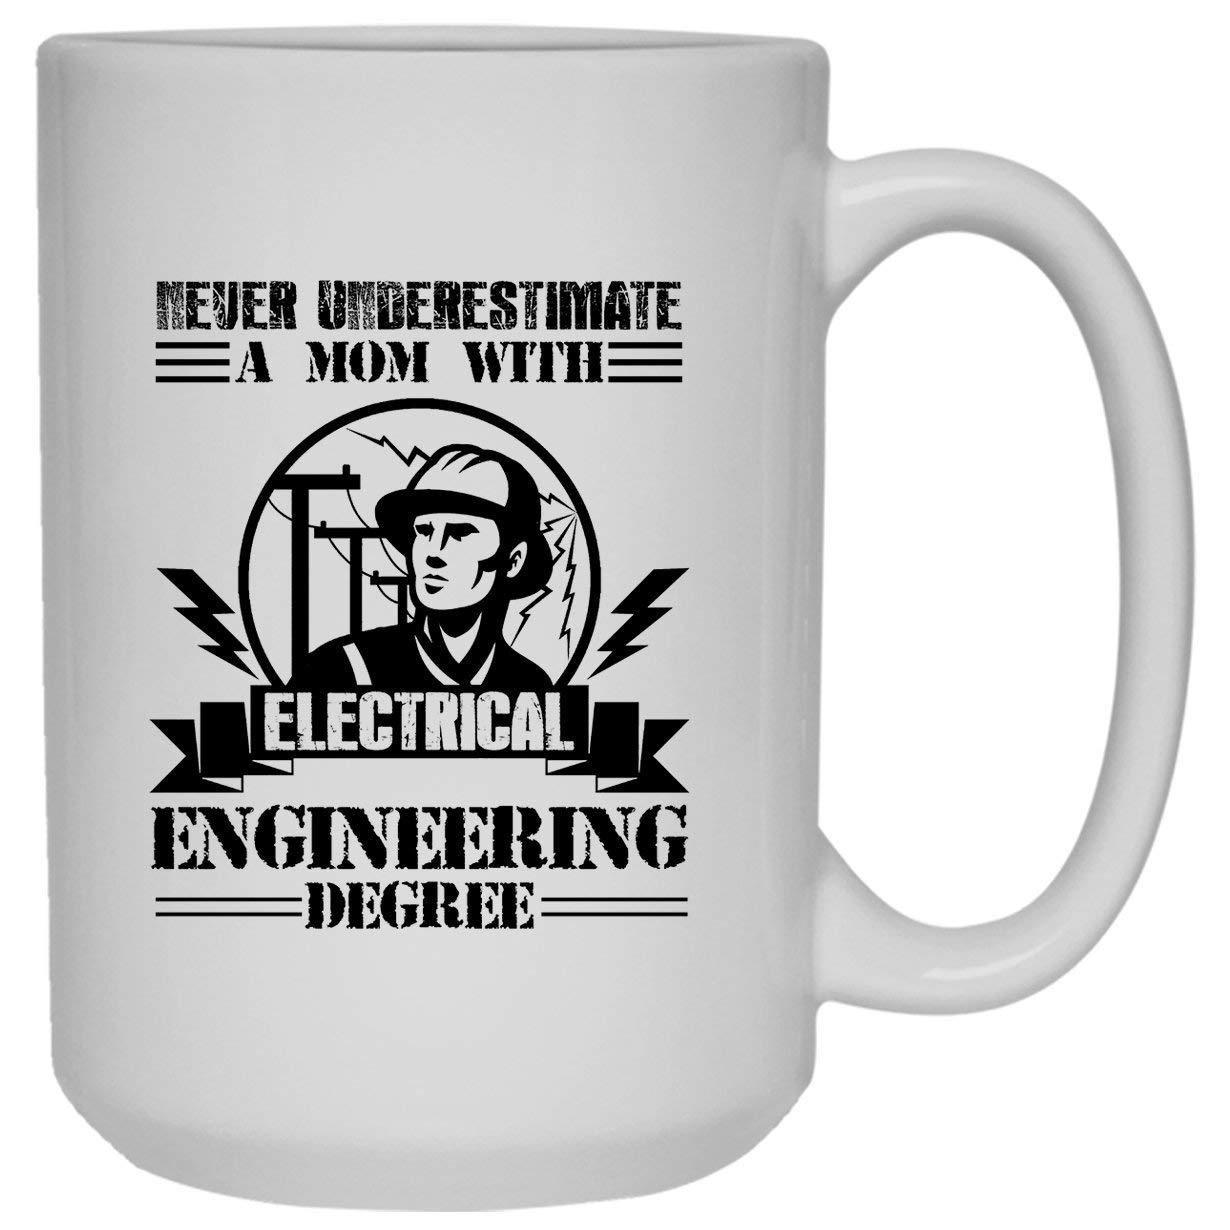 Electrical Engineering White Mugs - Electrical Engineering Ceramic Coffee Mug 15oz